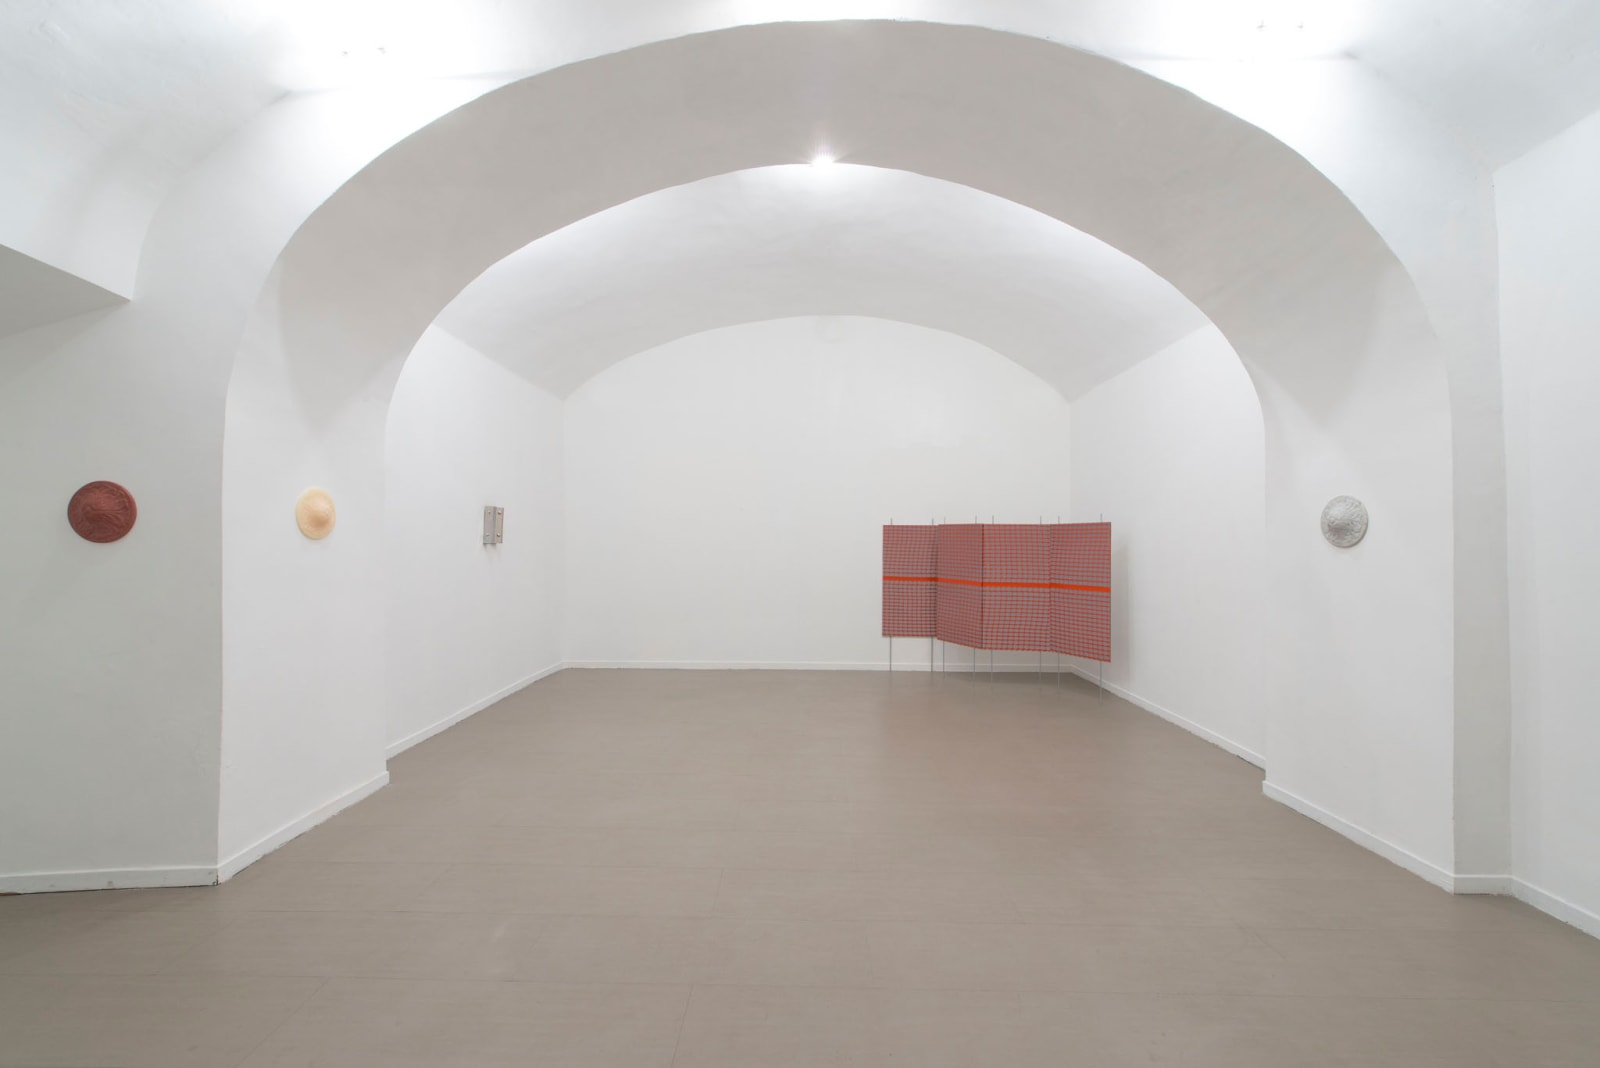 Giovanni de Cataldo, San Lorenzo, installation view at z2o Sara Zanin Gallery Rome